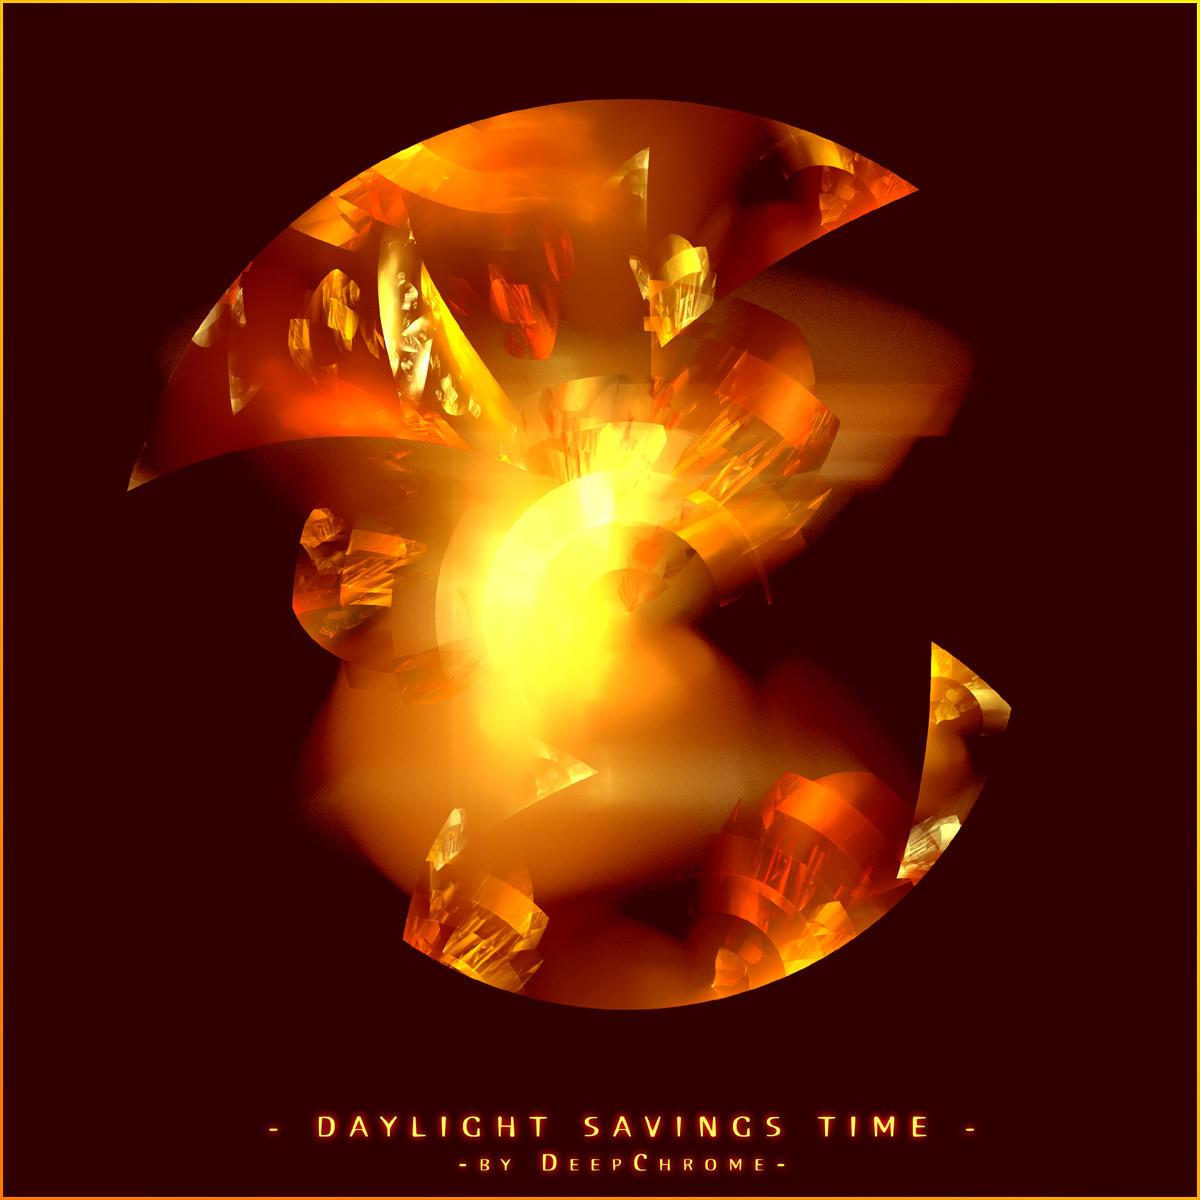 -DAYLIGHT SAVINGS TIME- by DeepChrome